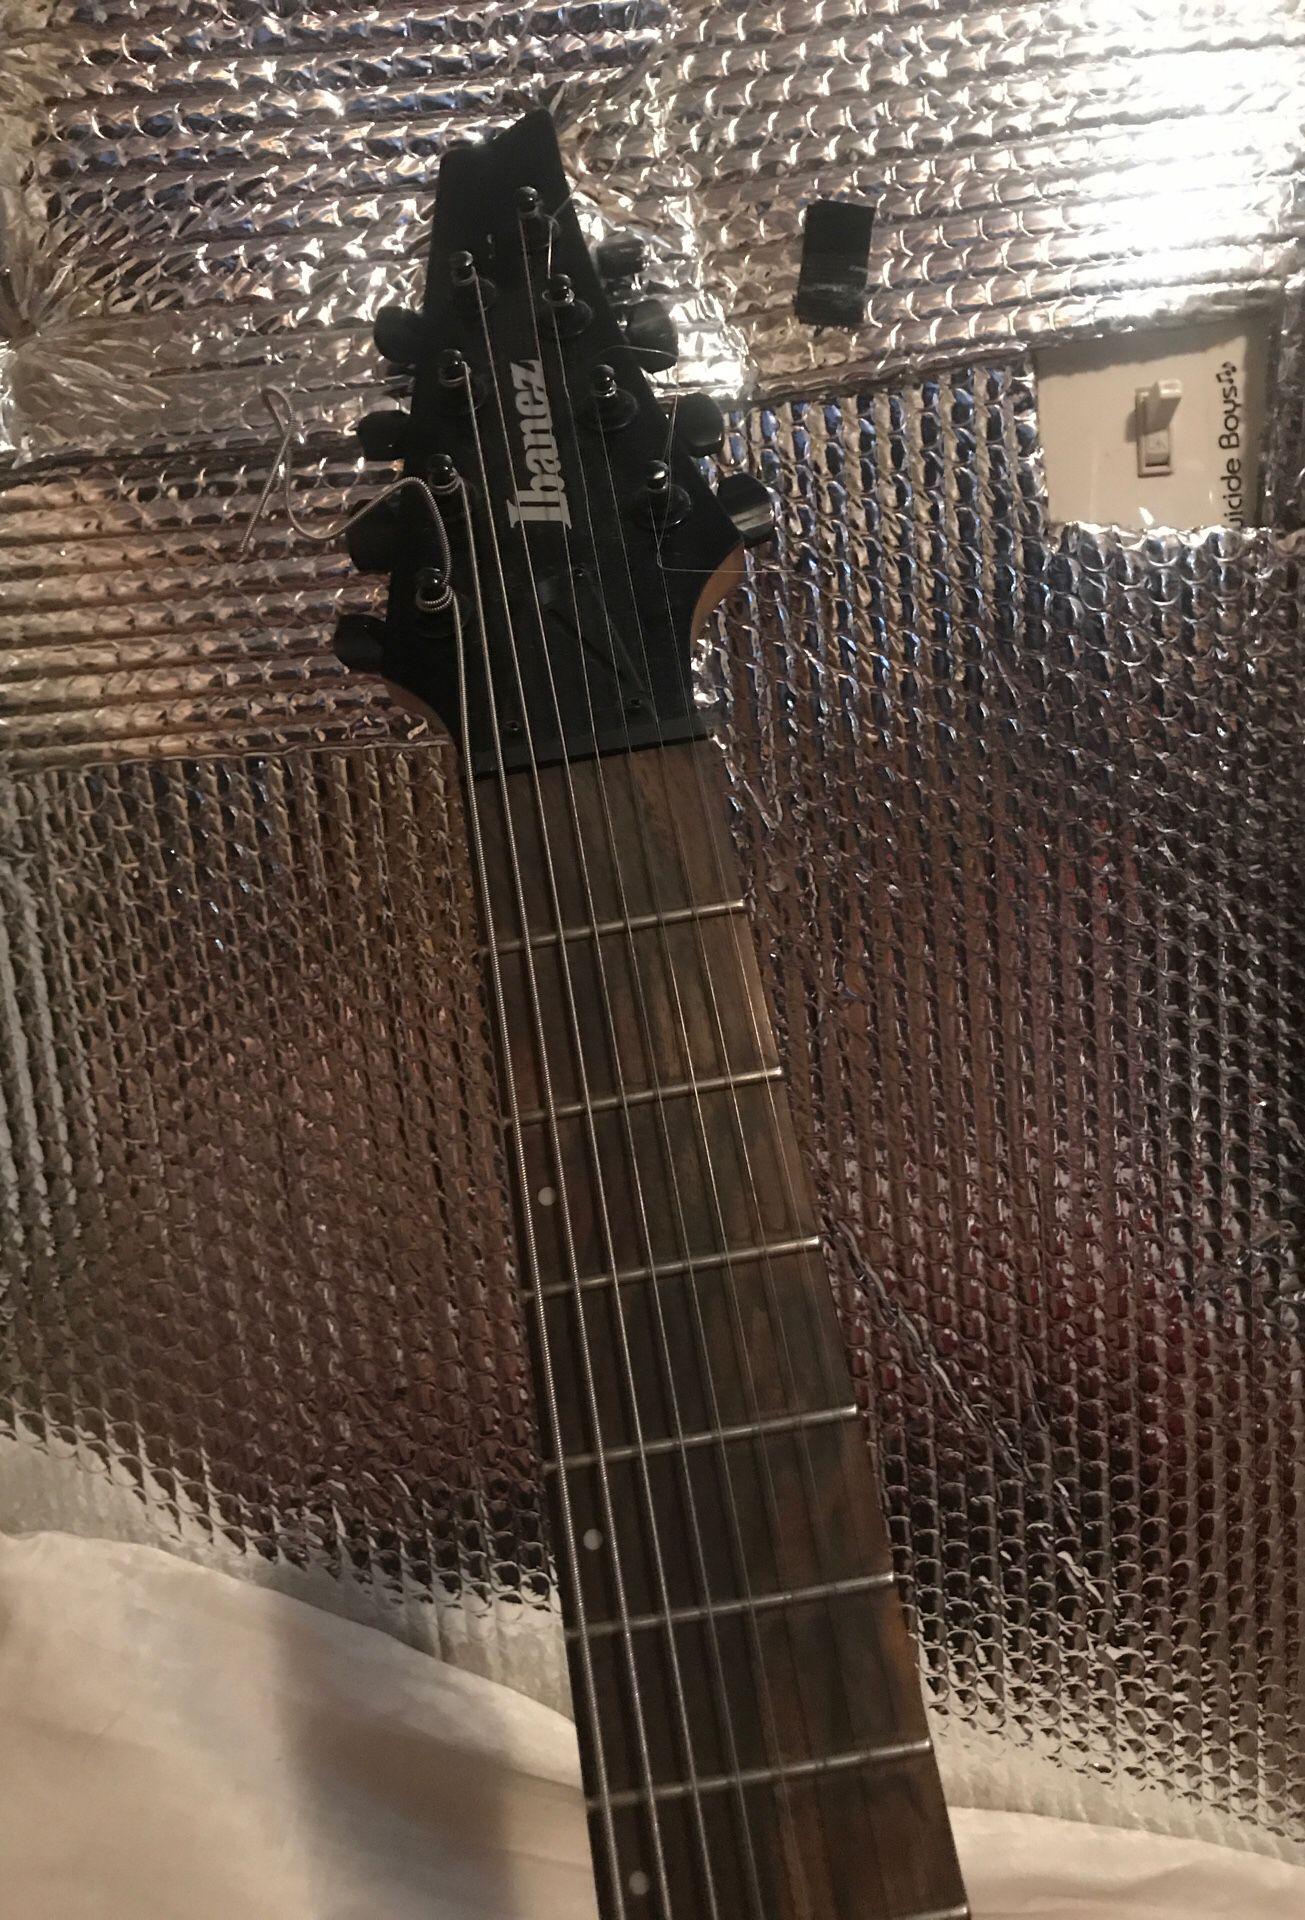 Ibanez 8 string electric guitar